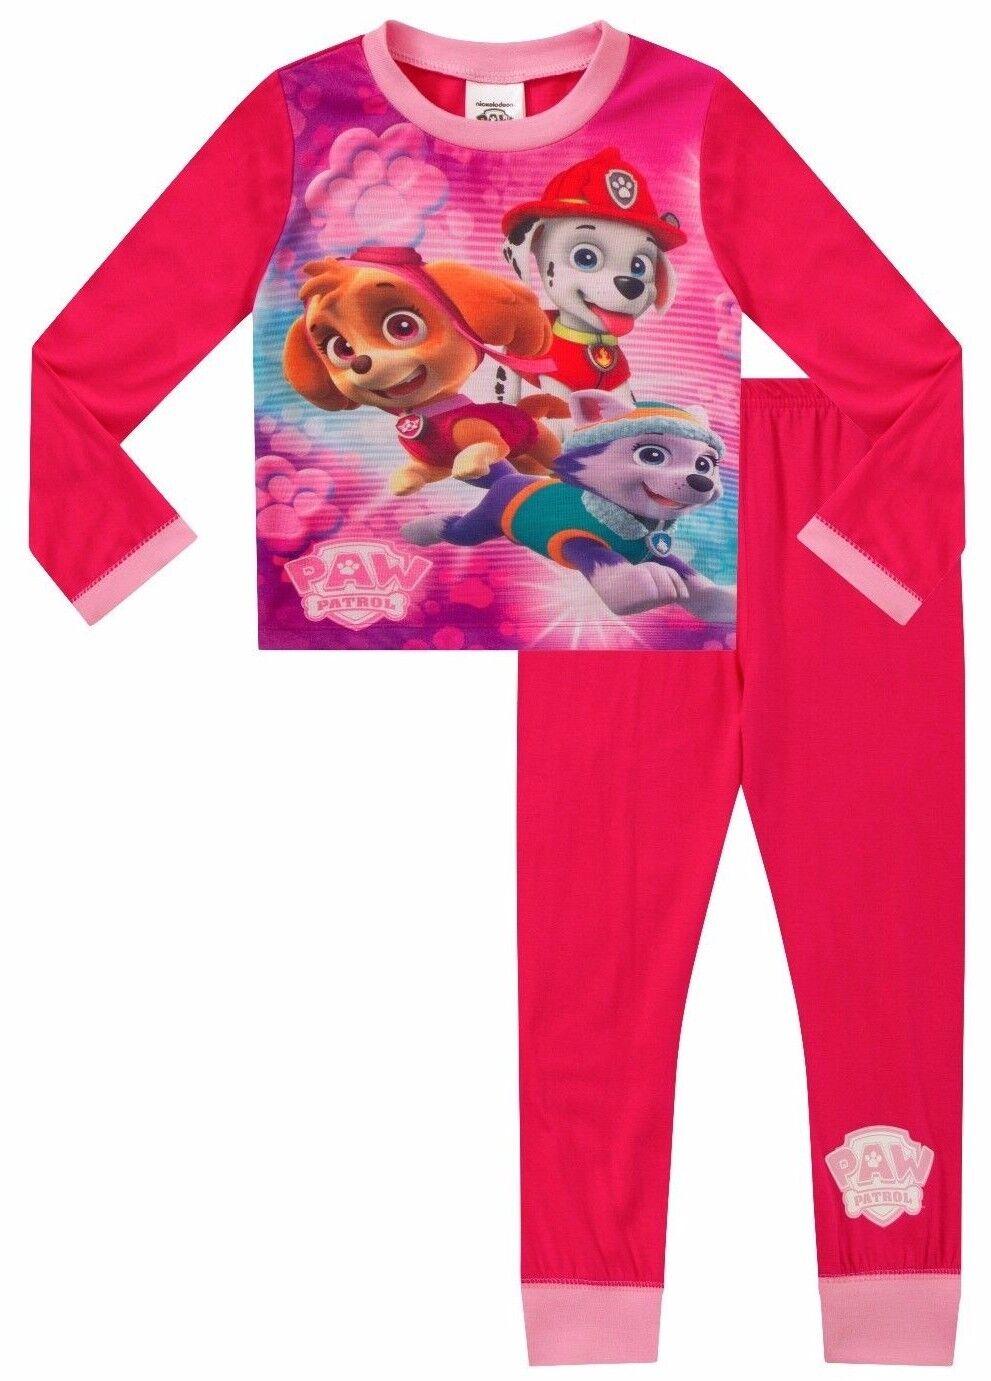 Girls Paw Patrol Long Pyjamas Paw Patrol Pjs  Nick Jr 5 to 7